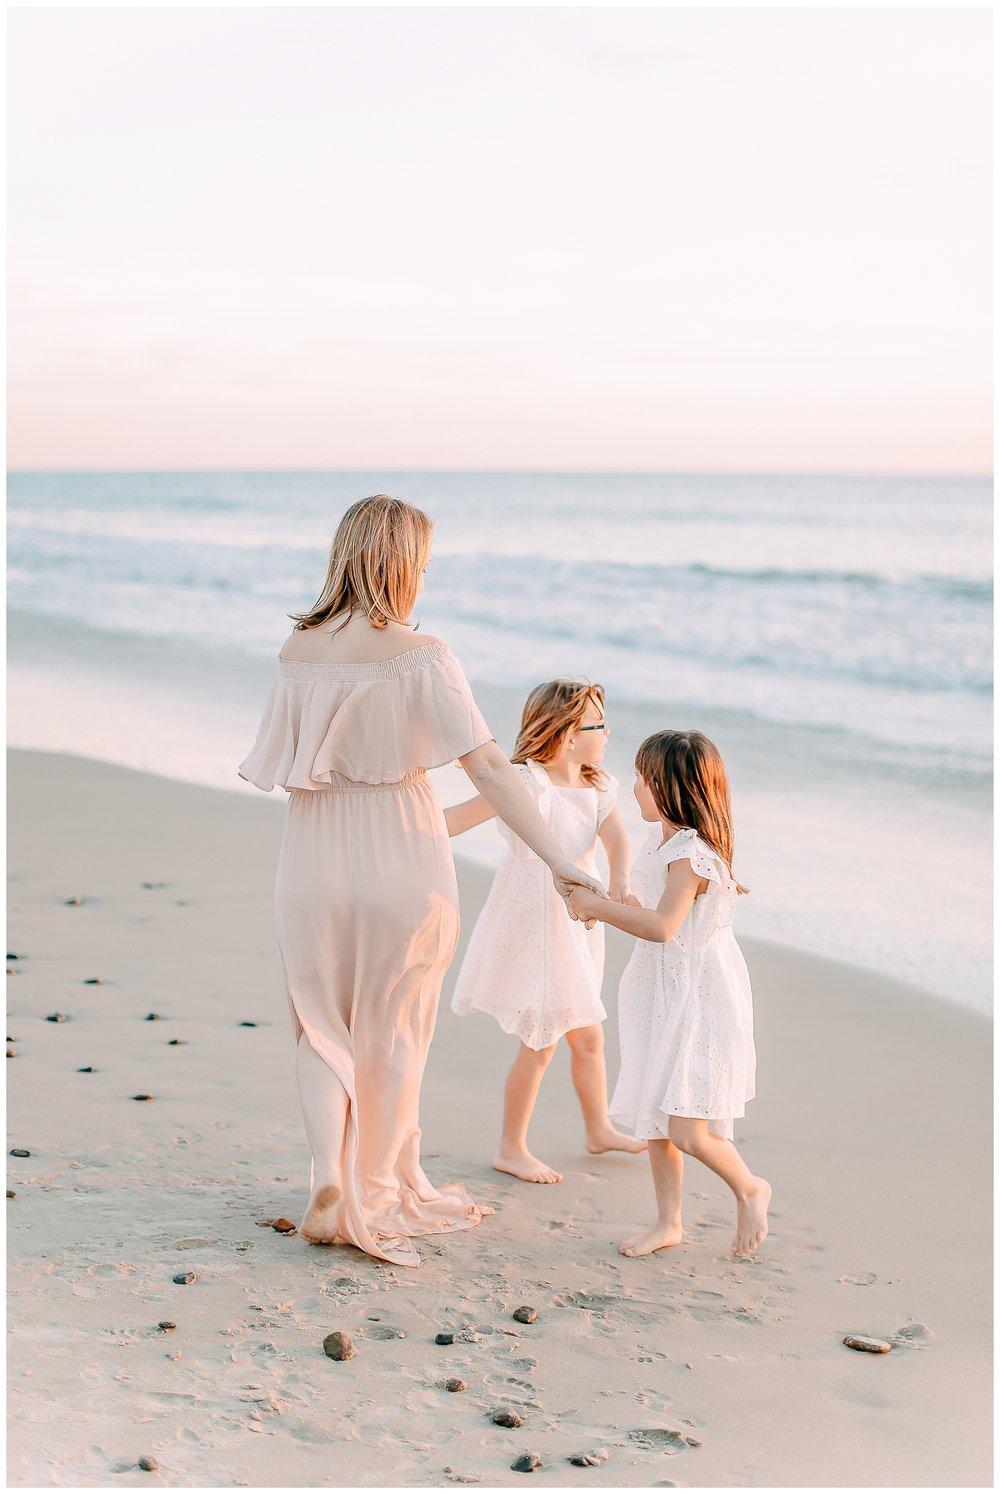 San_clemente_family_session_Orange_county_family_photographer_cori_kleckner_photography_laguna_beach_family_session_0694.jpg